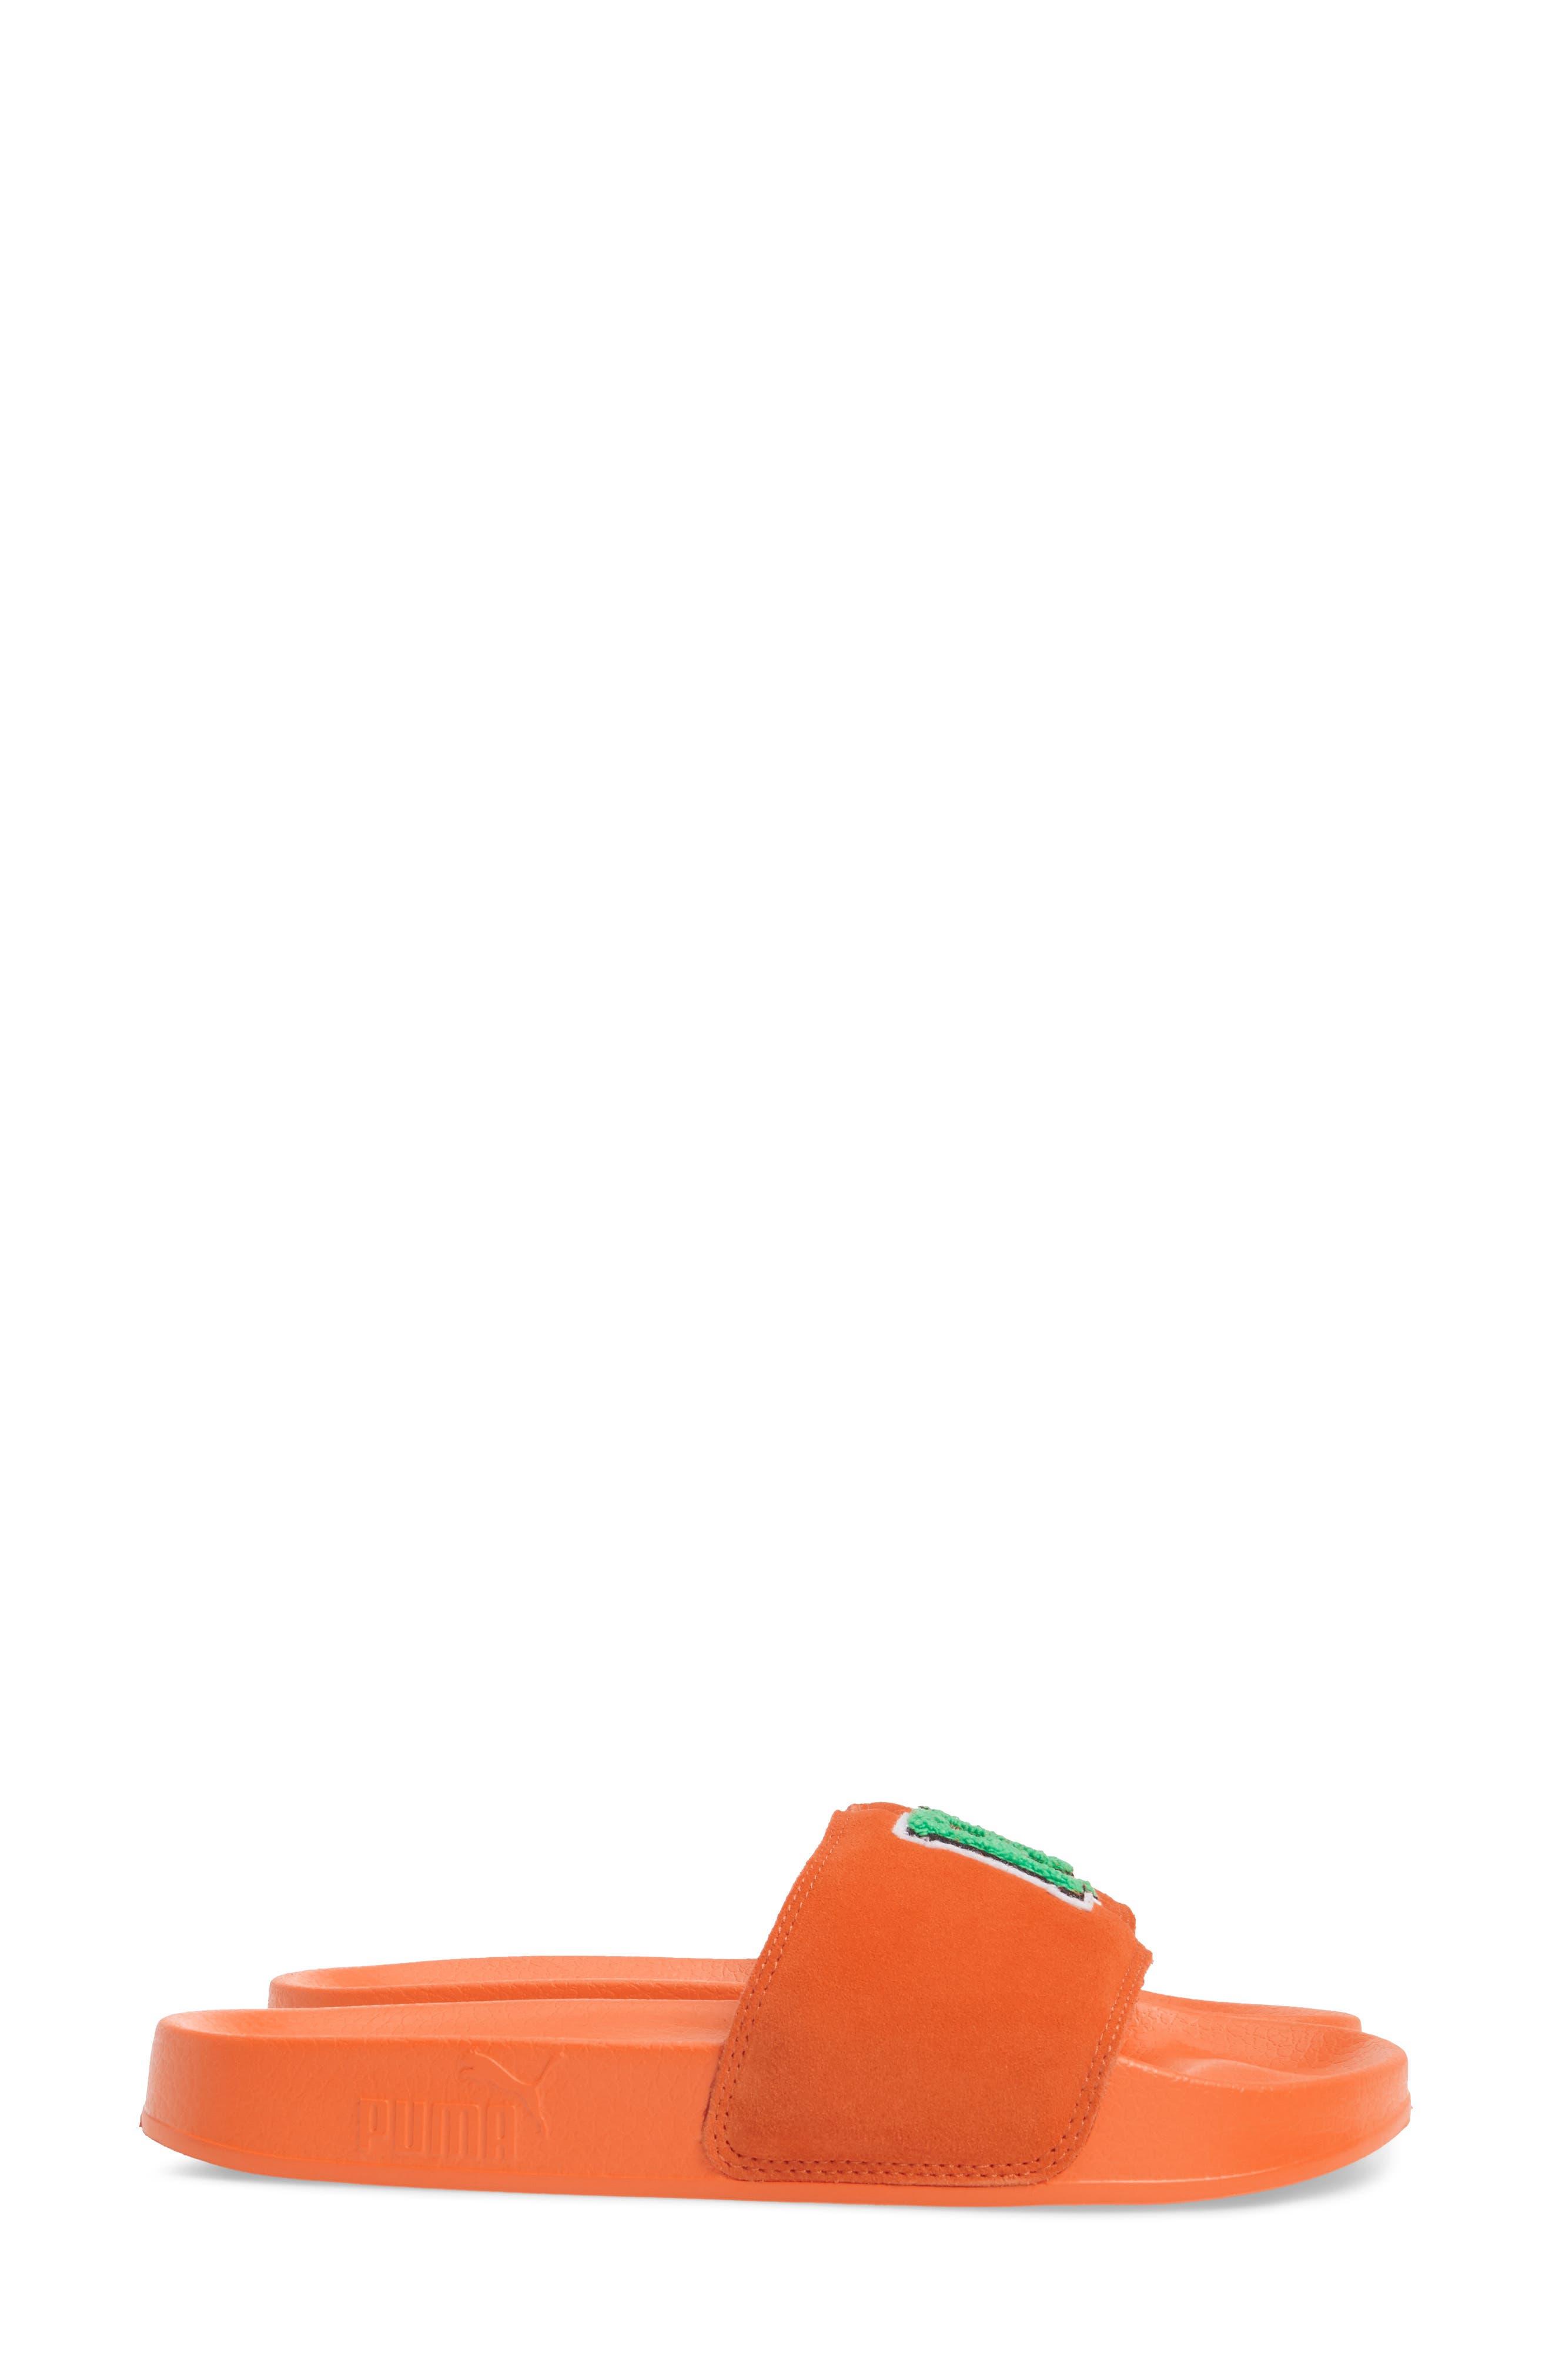 FENTY PUMA by Rihanna Lead Cat Slide Sandals,                             Alternate thumbnail 11, color,